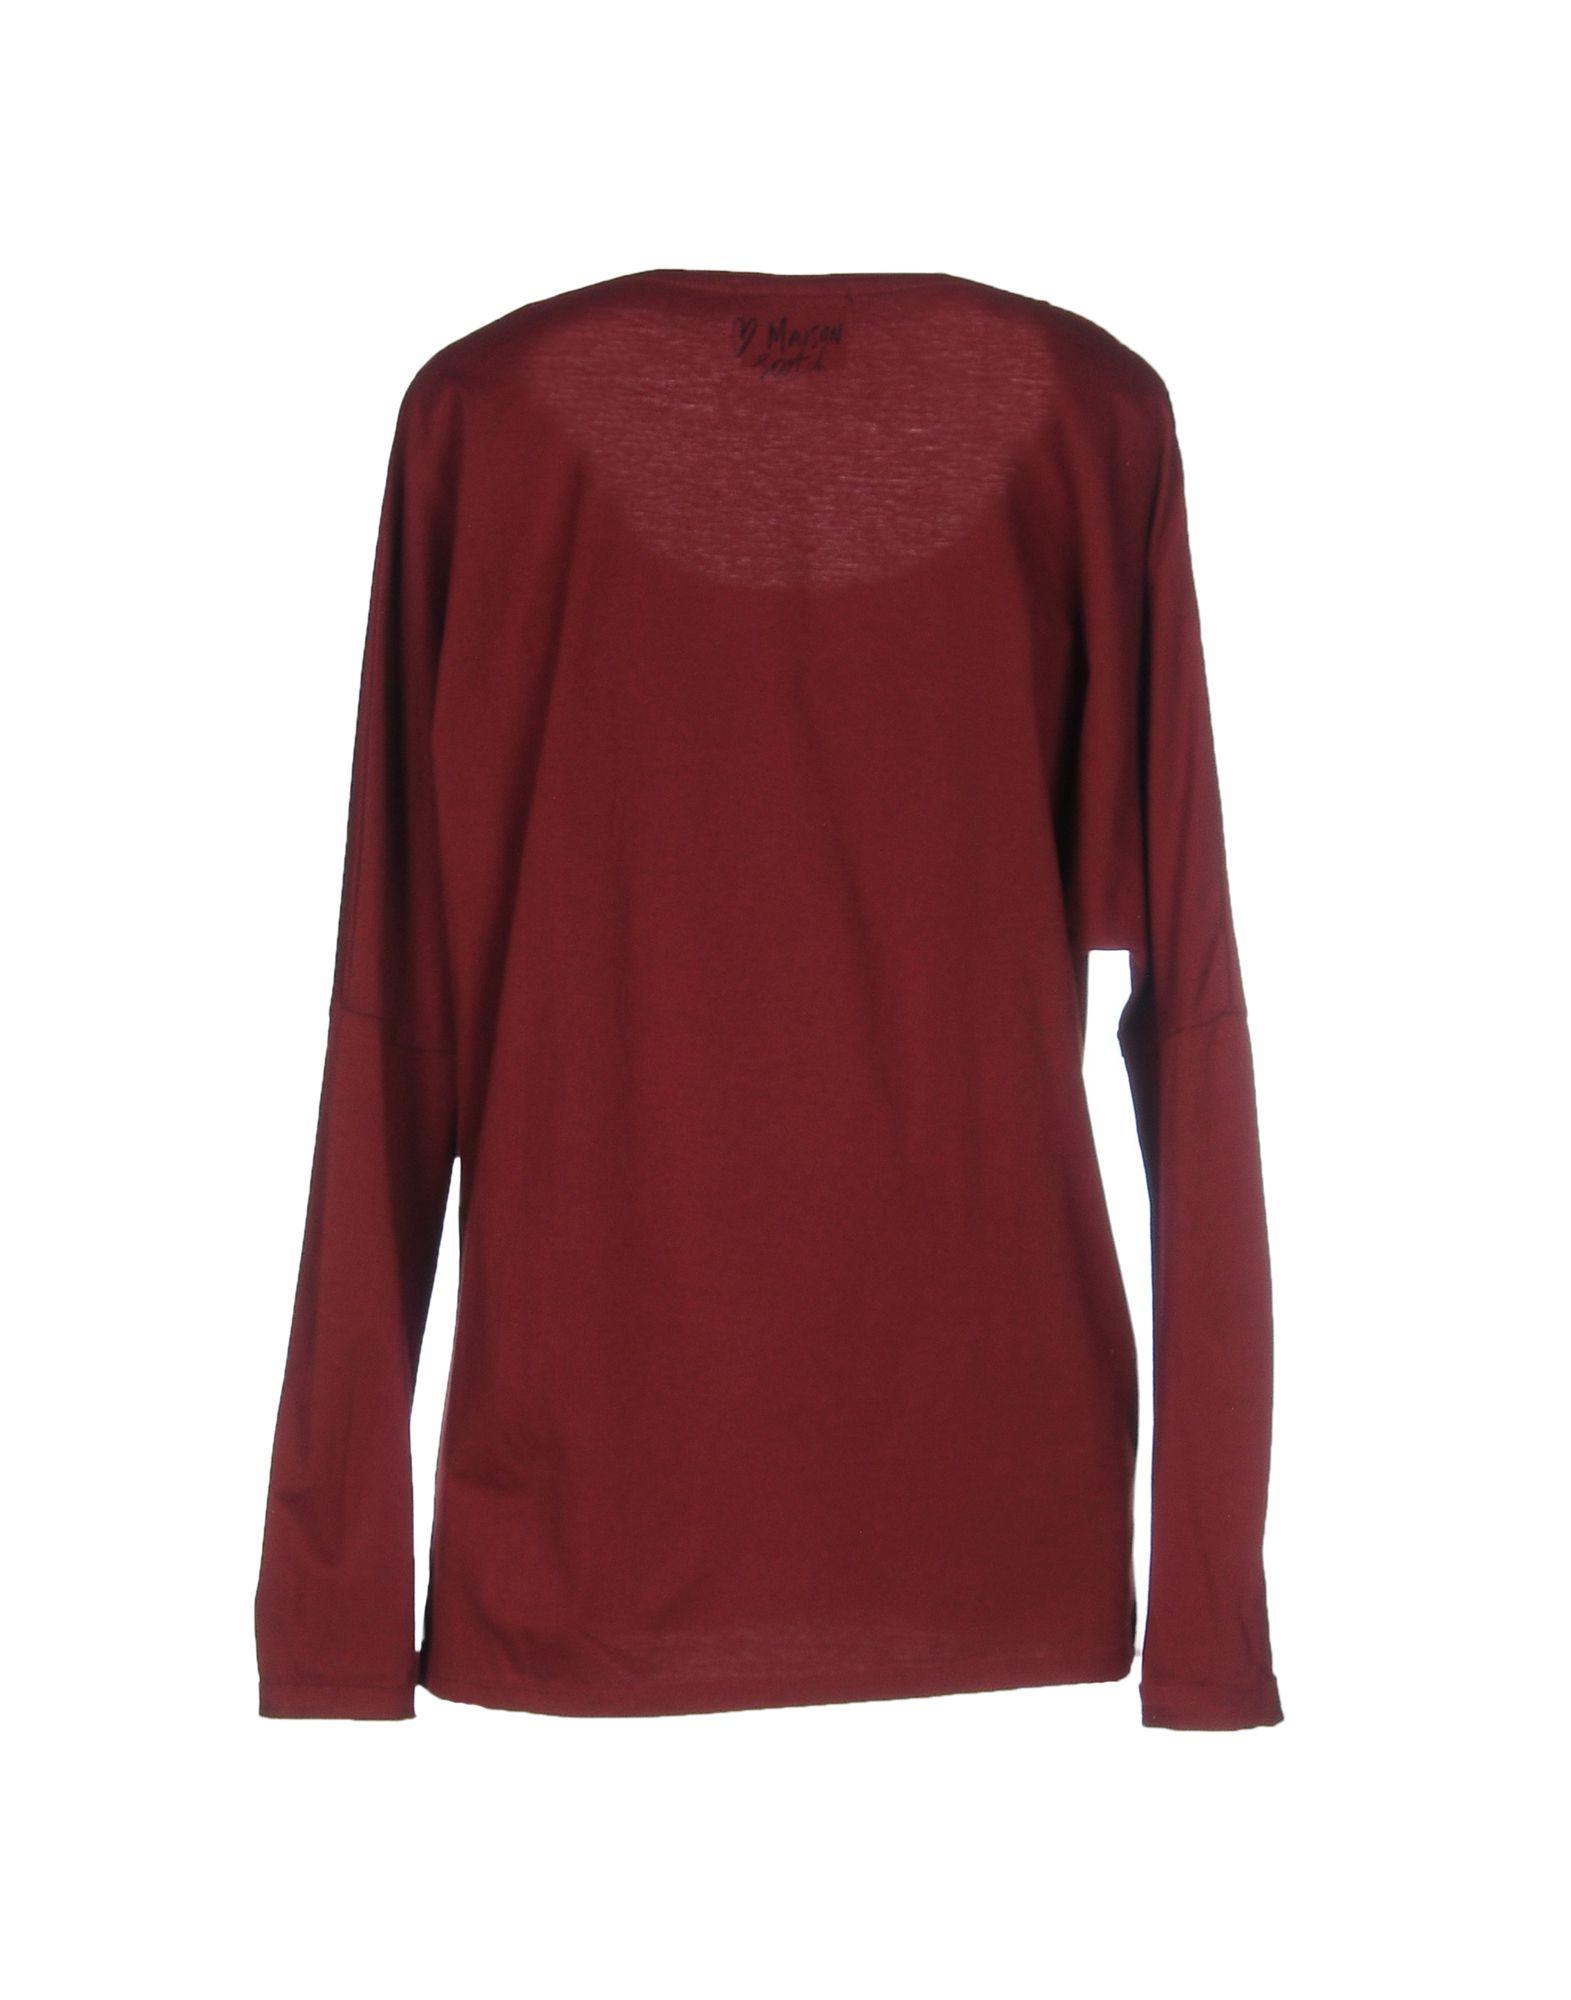 maison scotch t shirt in purple maroon lyst